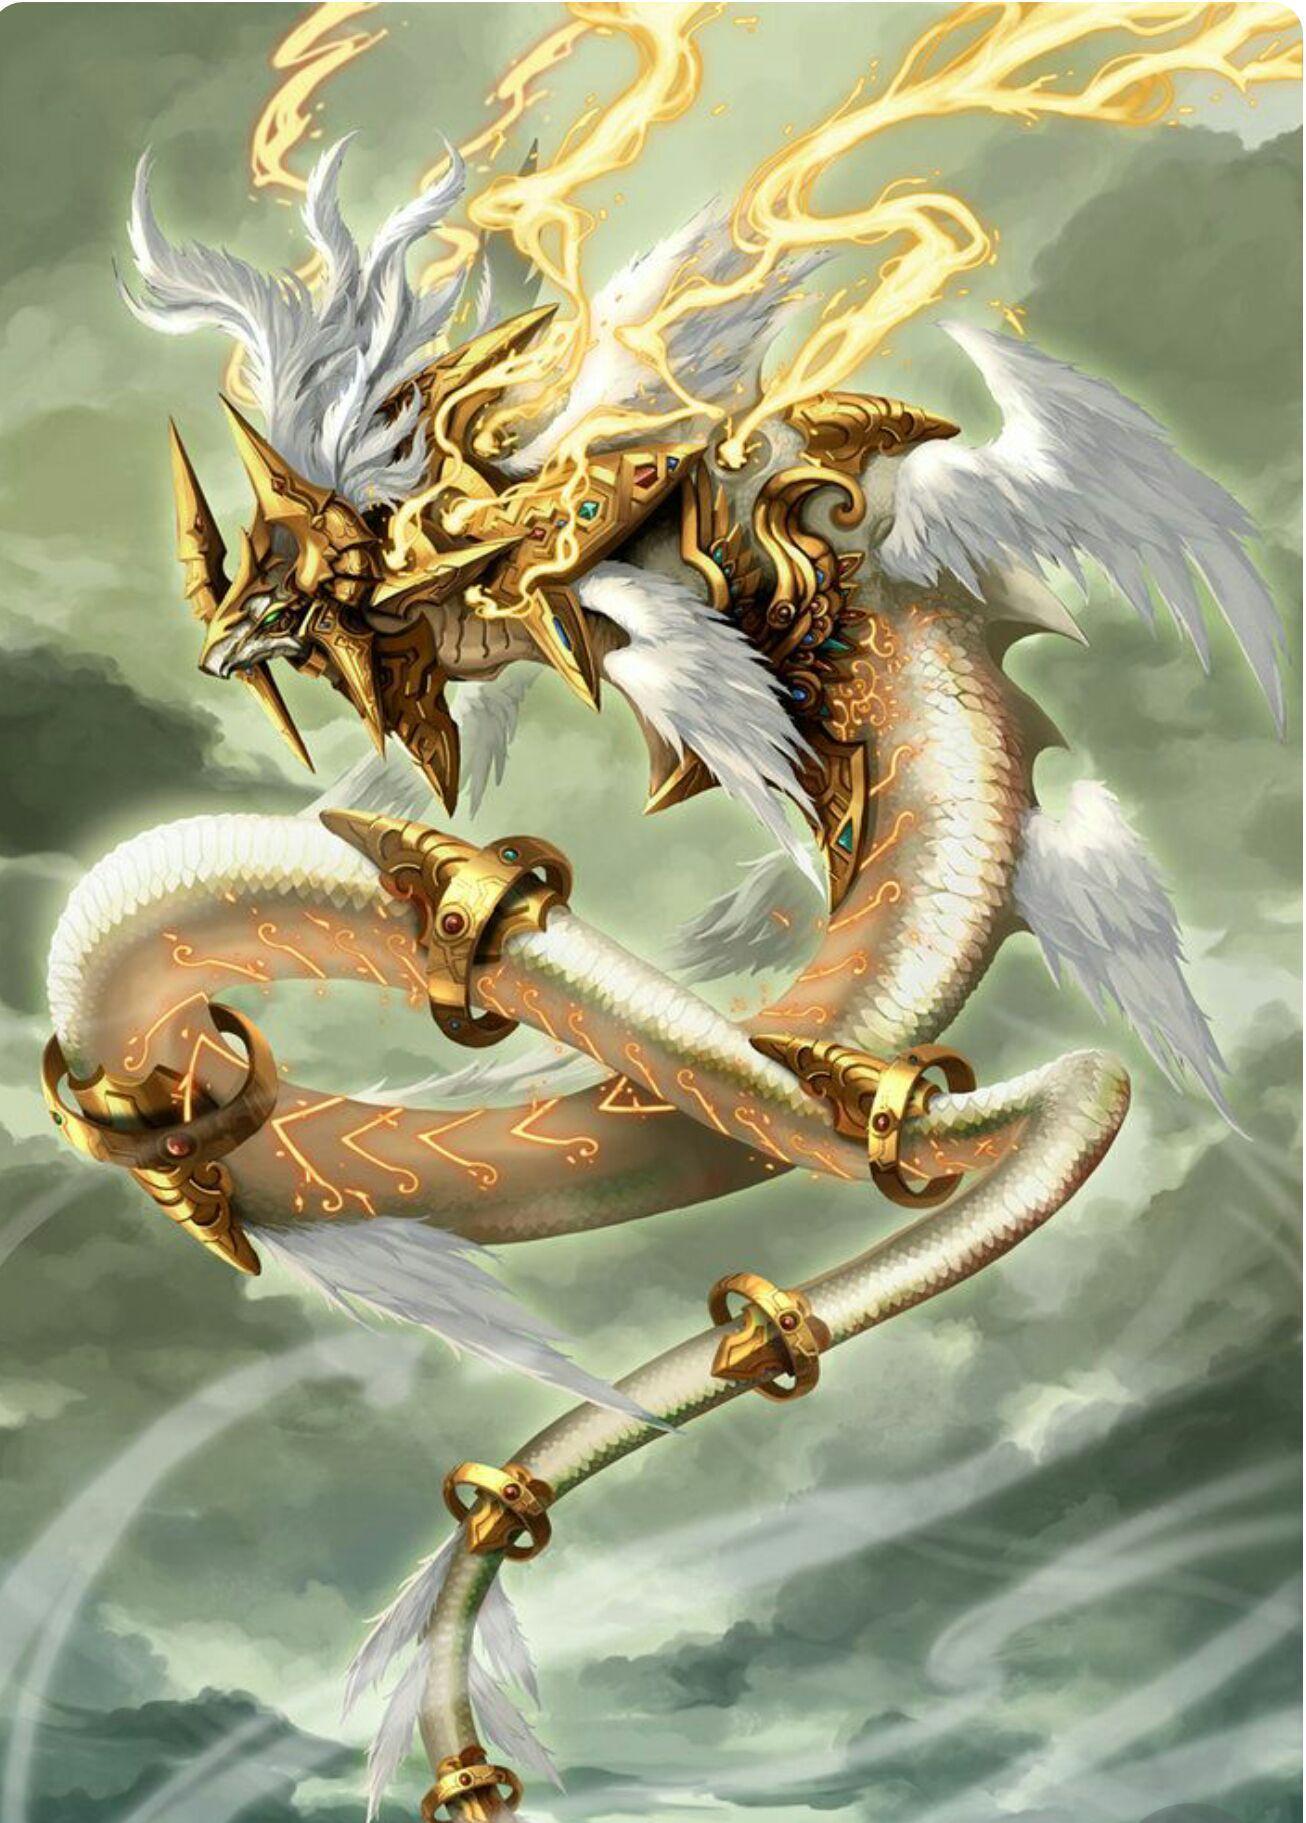 294f4cd573e8 Hyoudou Issei El Caballero Dragon Universal - Noche de Pasion y ...